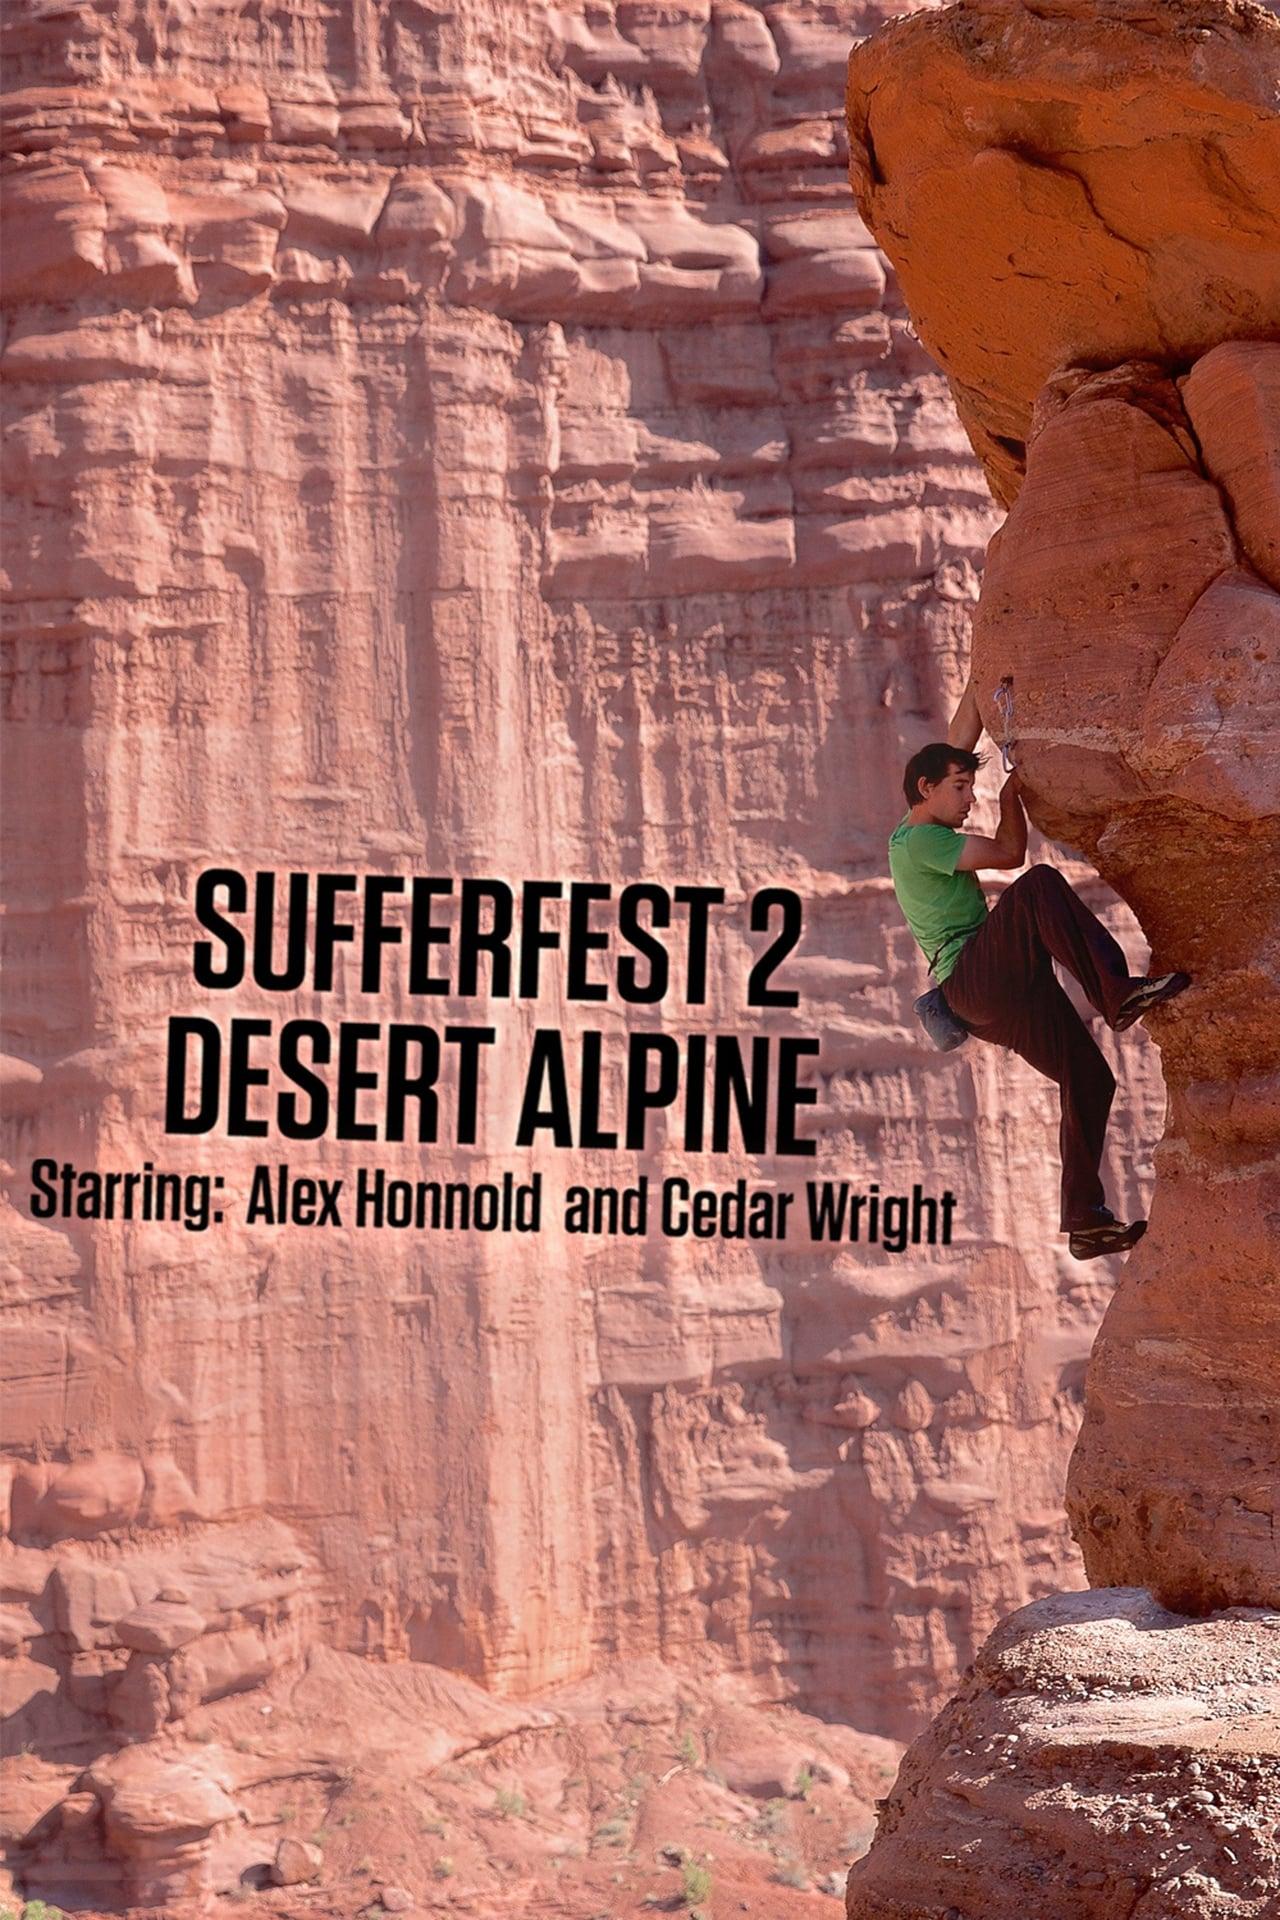 Sufferfest 2: Desert Alpine